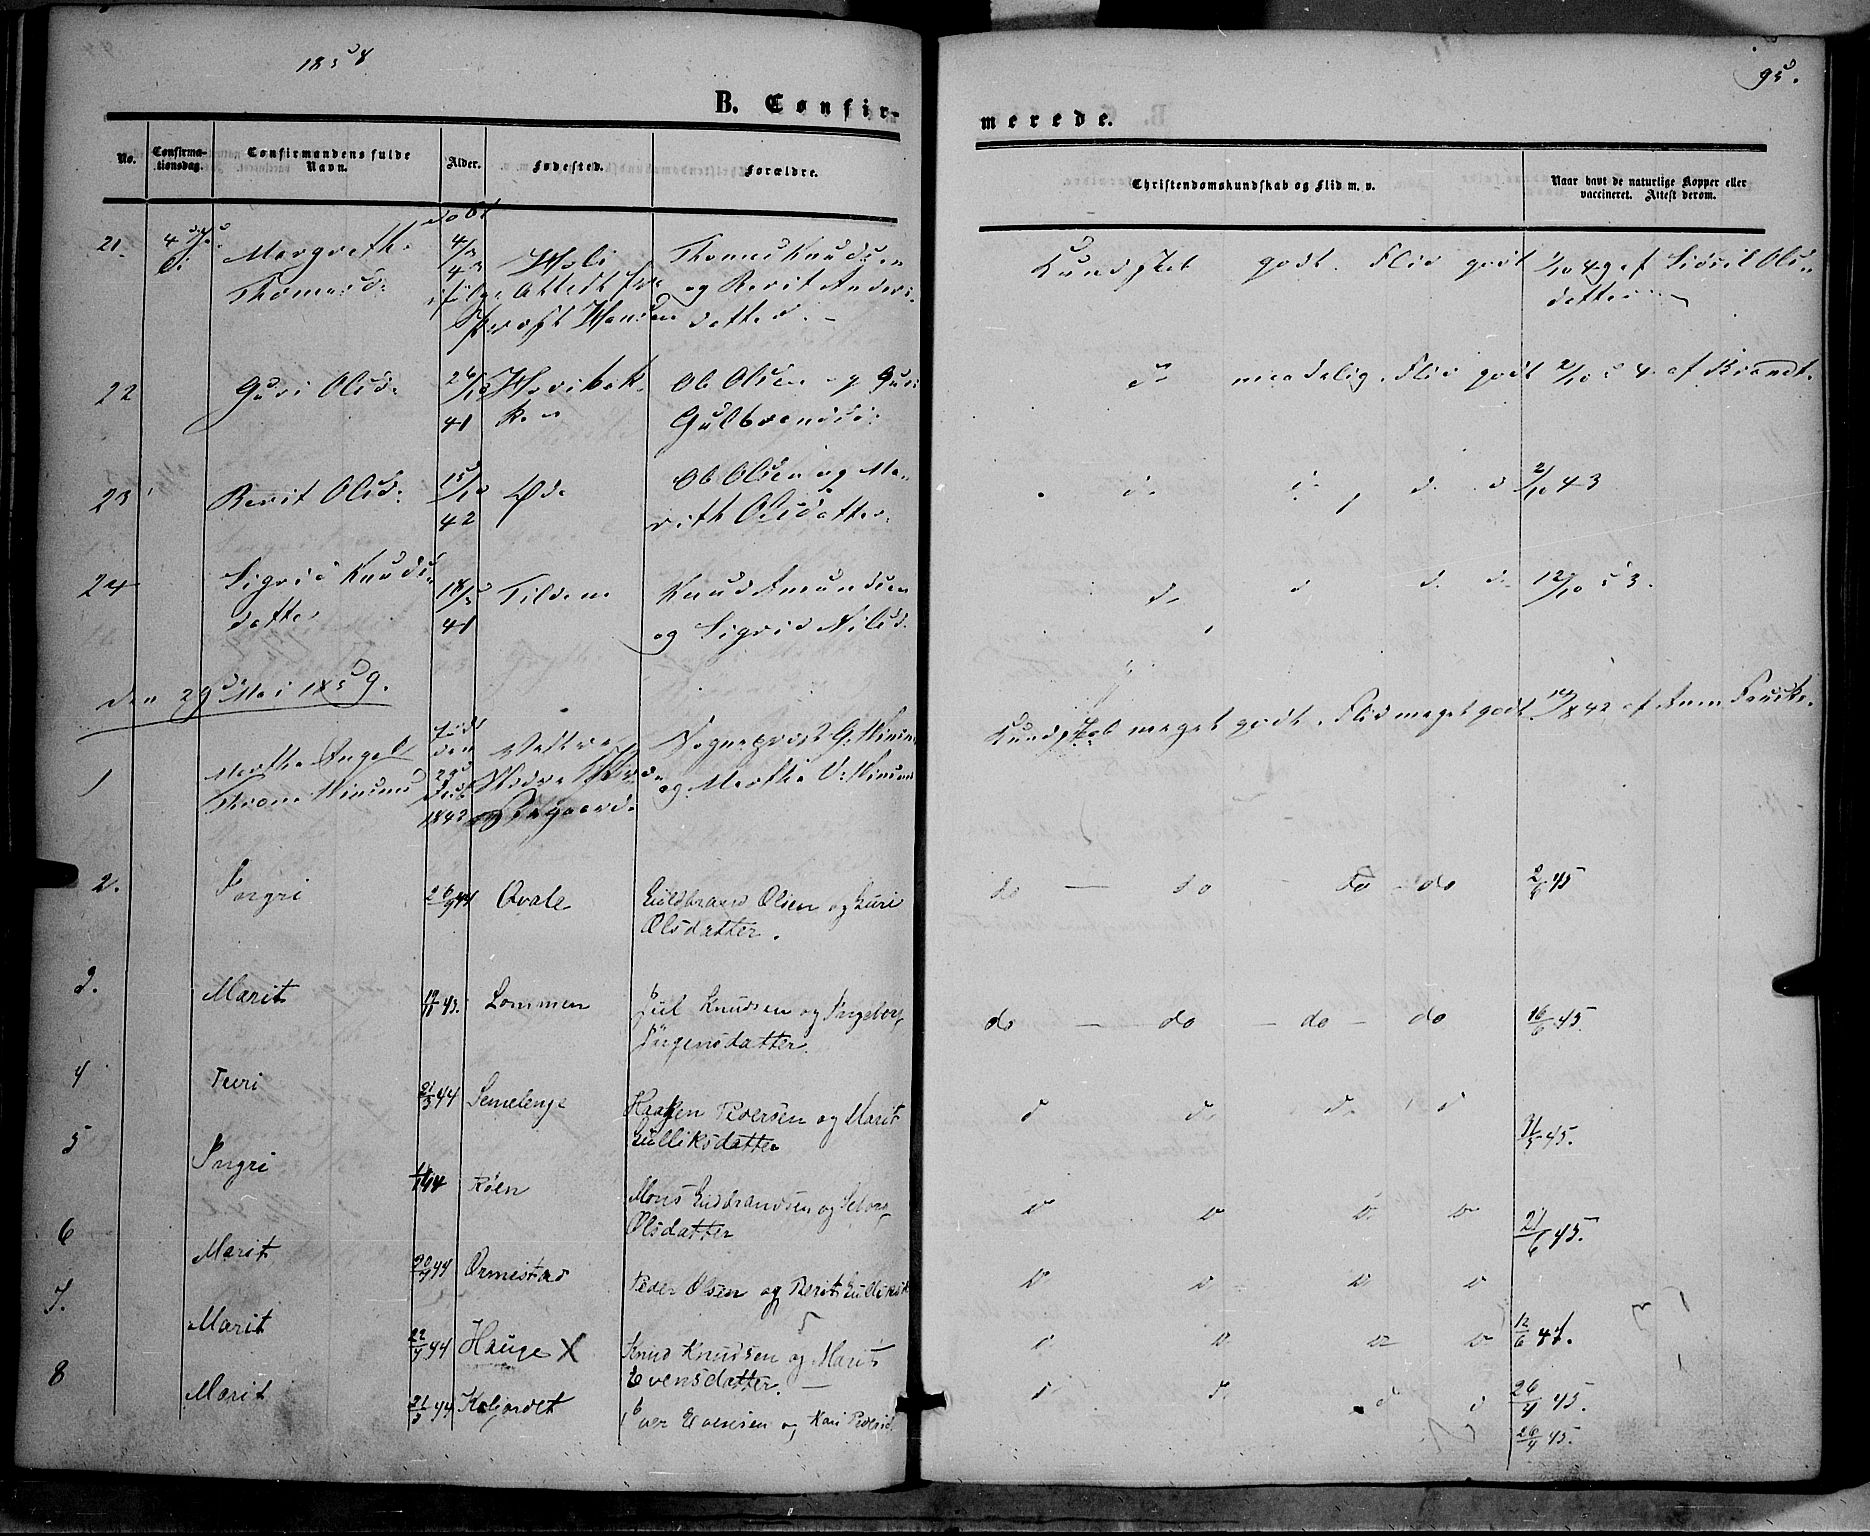 SAH, Vestre Slidre prestekontor, Ministerialbok nr. 2, 1856-1864, s. 95